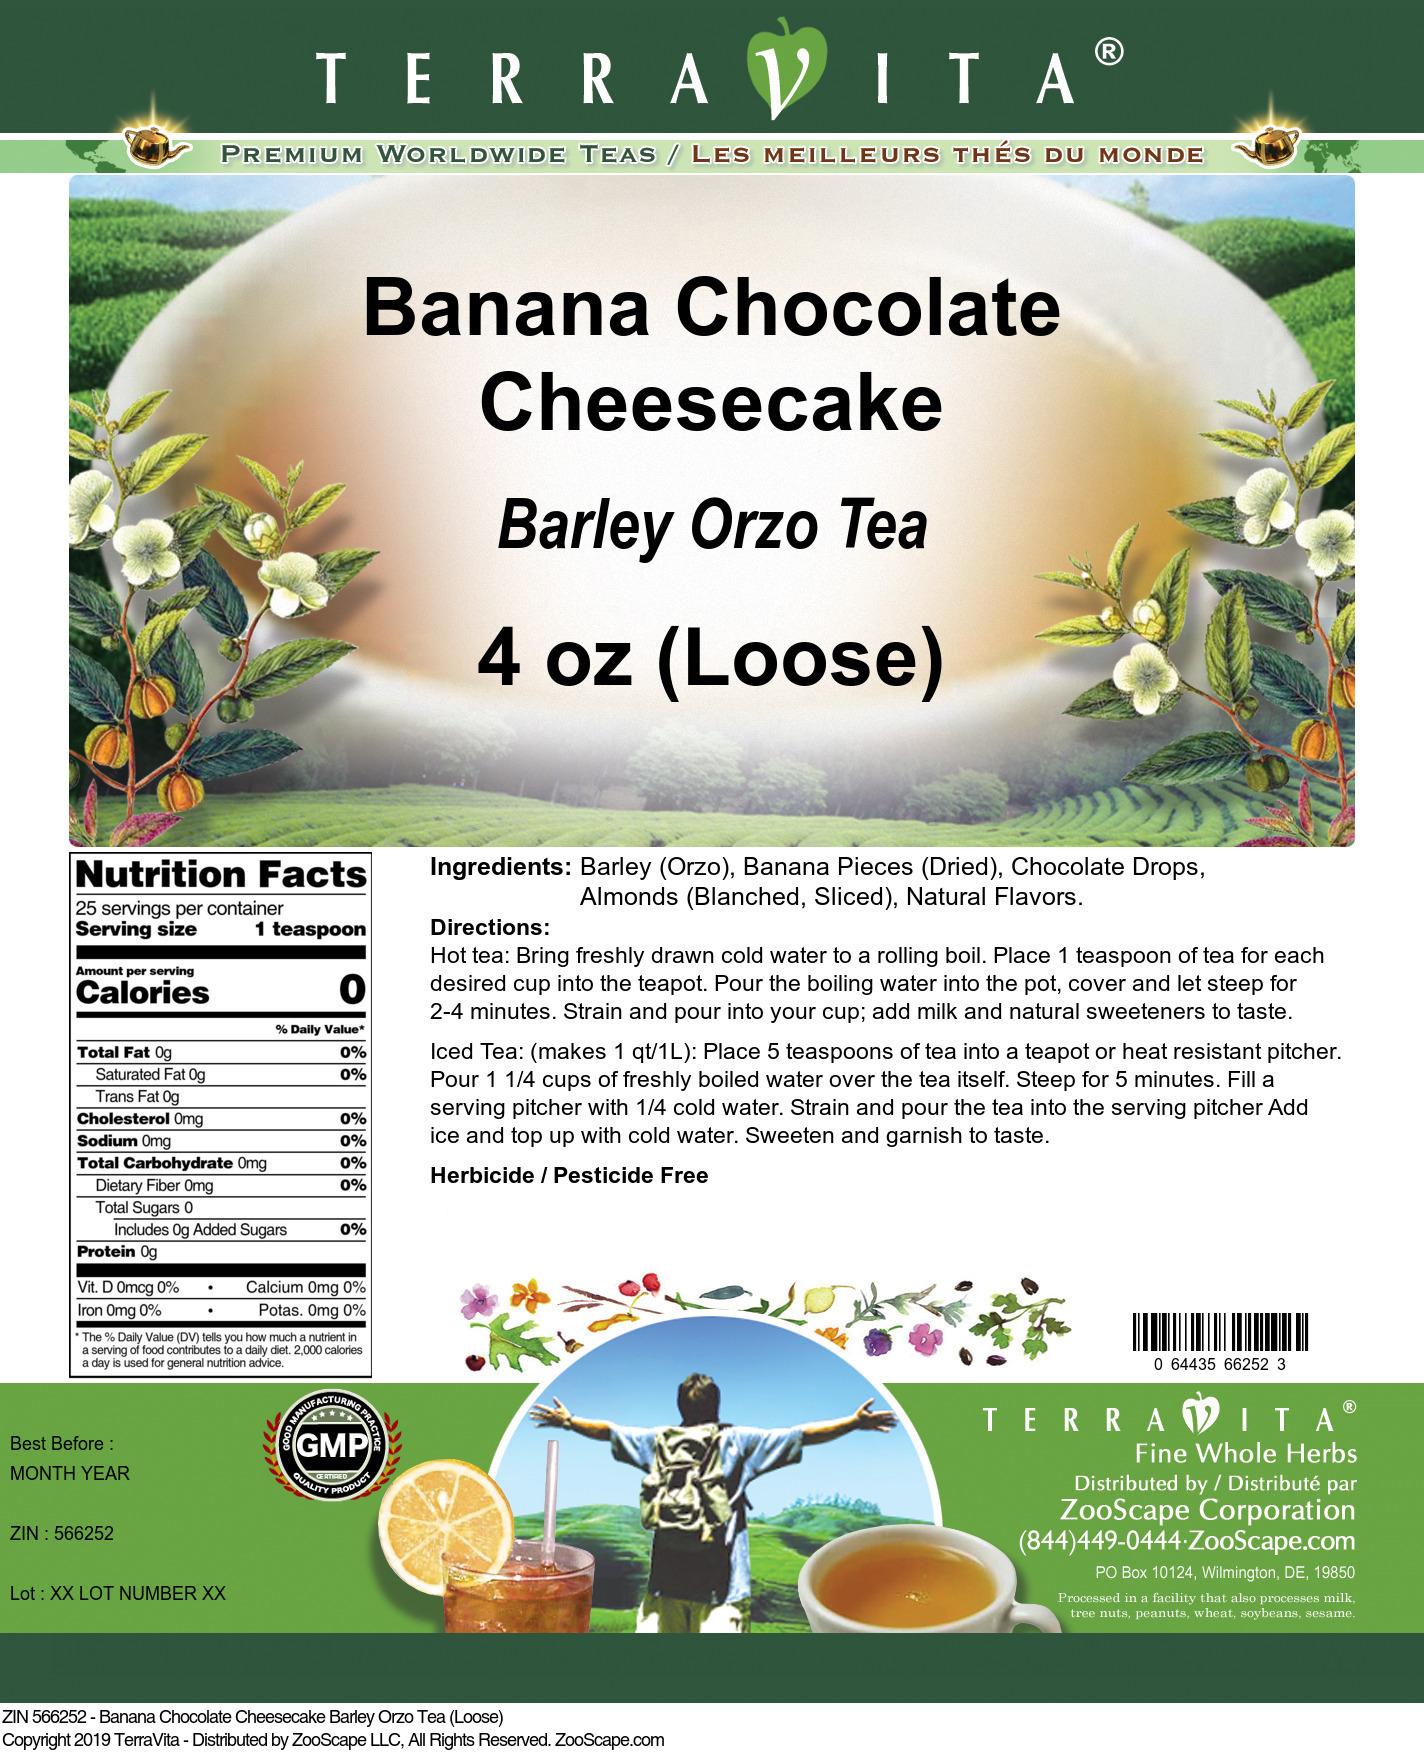 Banana Chocolate Cheesecake Barley Orzo Tea (Loose)